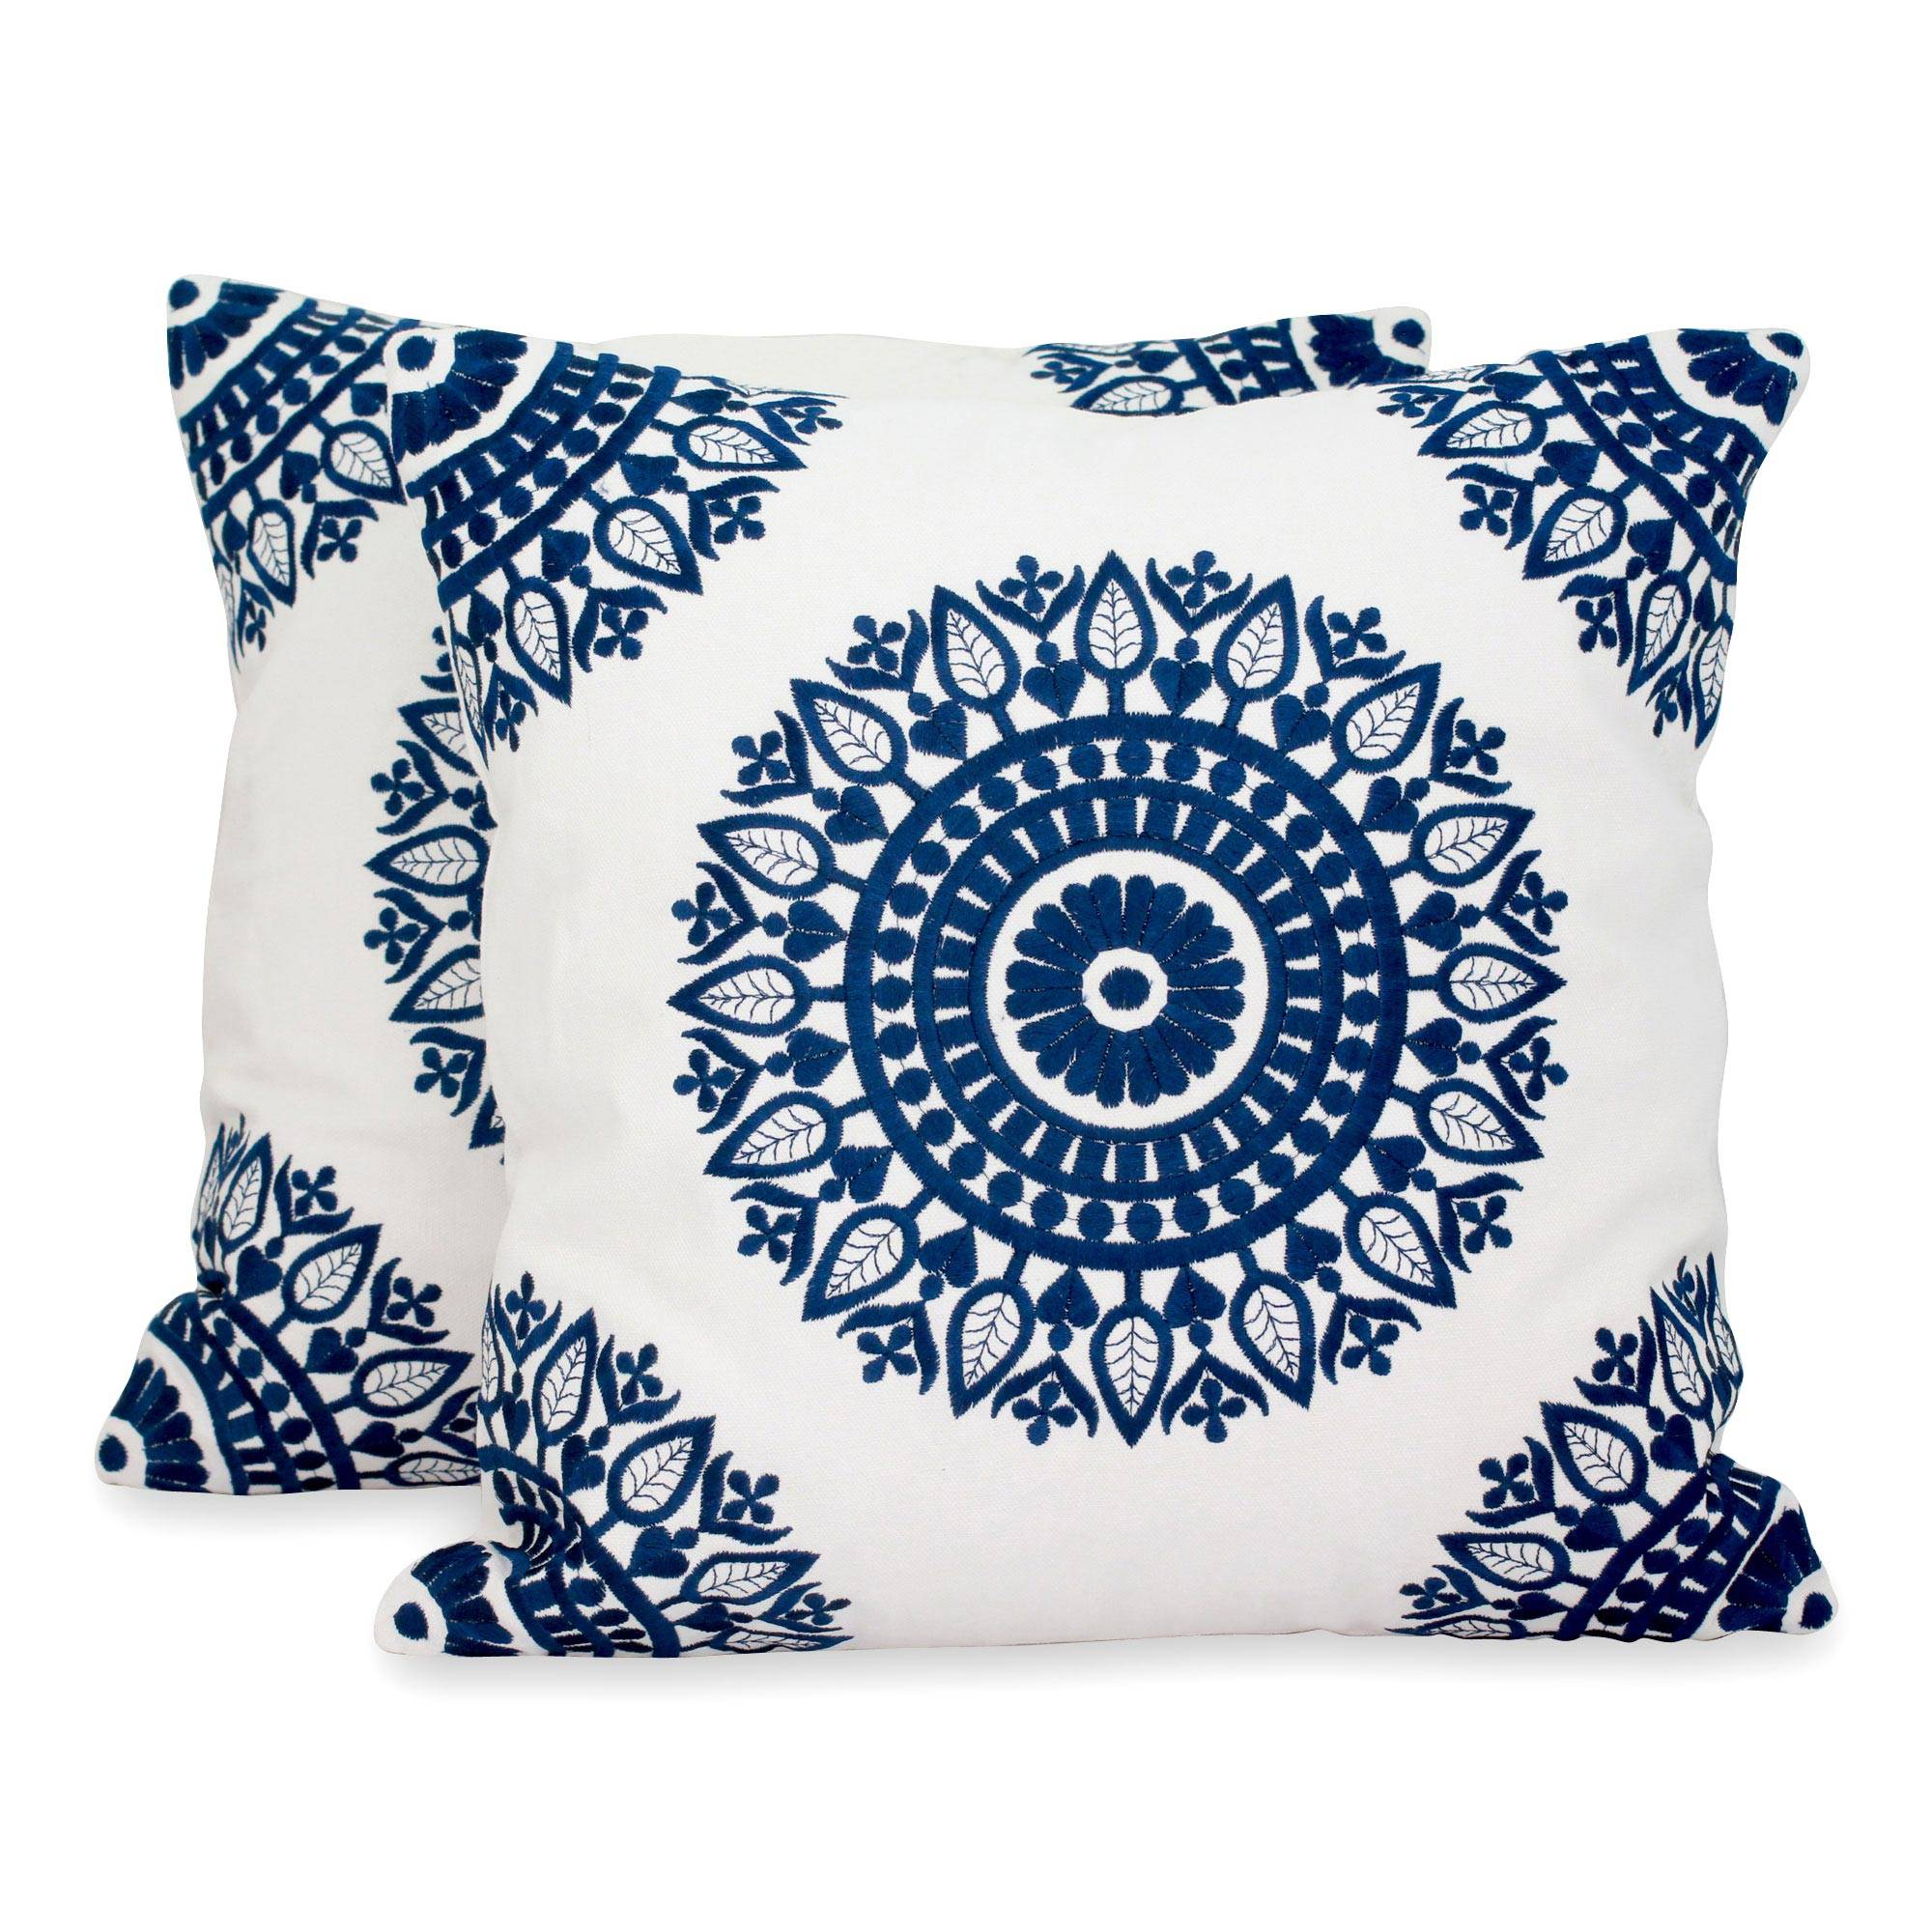 Unicef Uk Market Indian Embroidered Dark Blue On White Cushion Covers Pair Sapphire Blue Mandalas